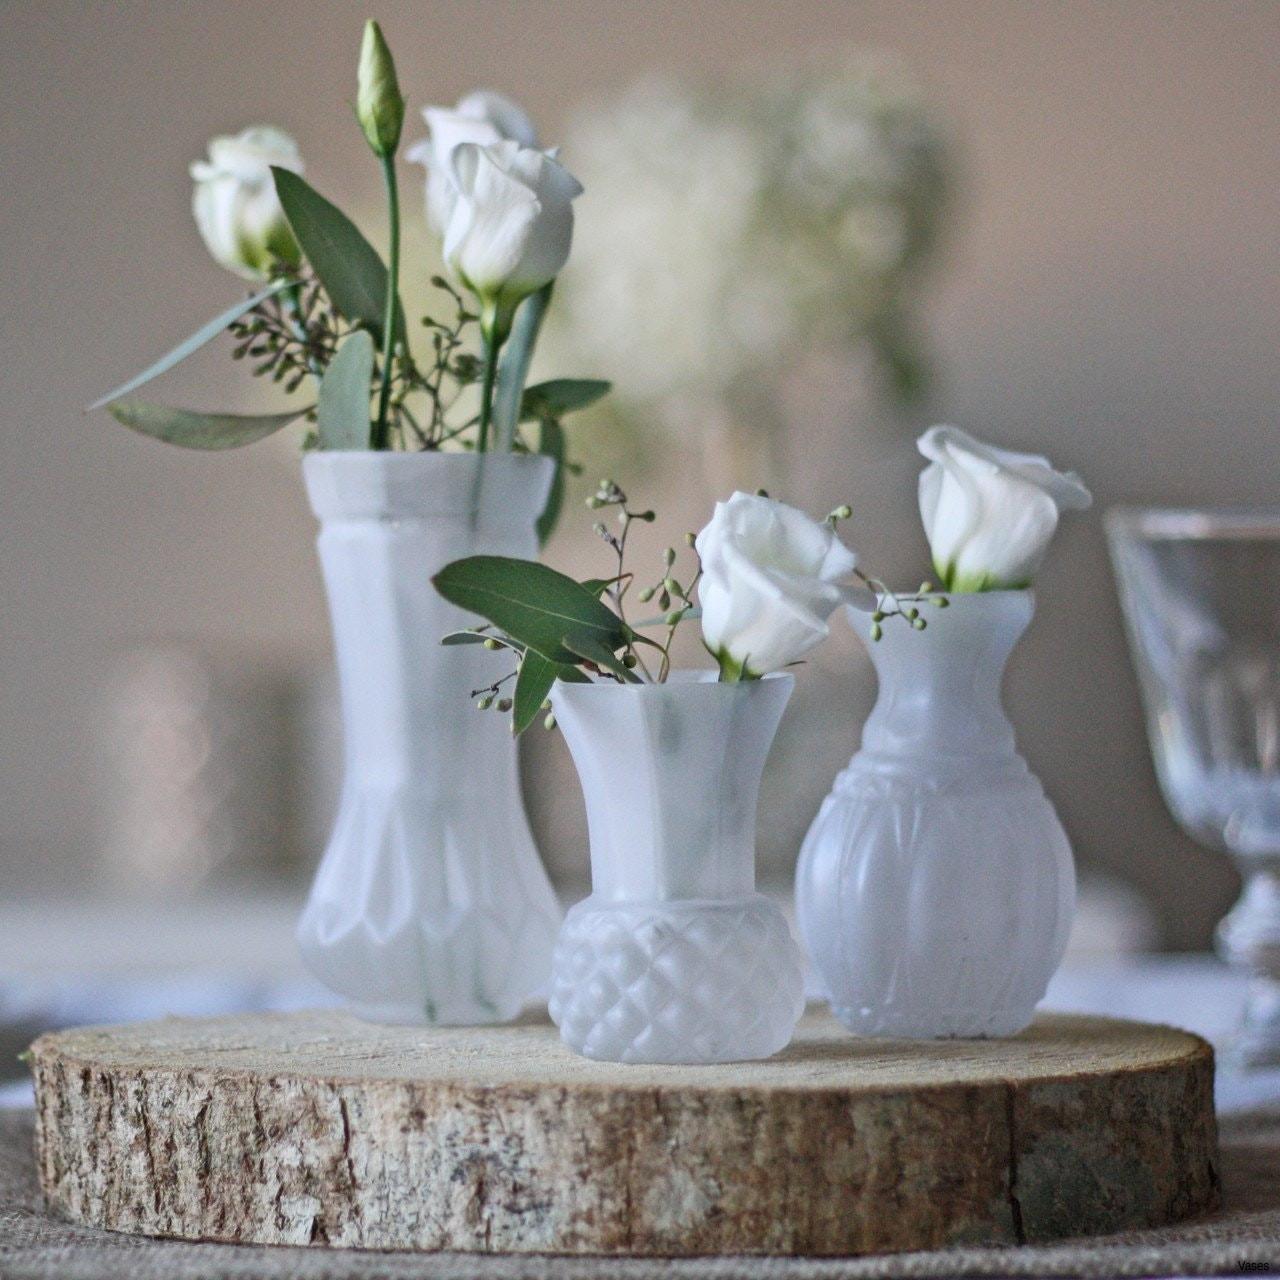 vintage clear glass vases of glass bud vases pictures 4 vintage clear glass vases hoosier glass inside glass bud vases stock jar flower 1h vases bud wedding vase centerpiece idea i 0d white